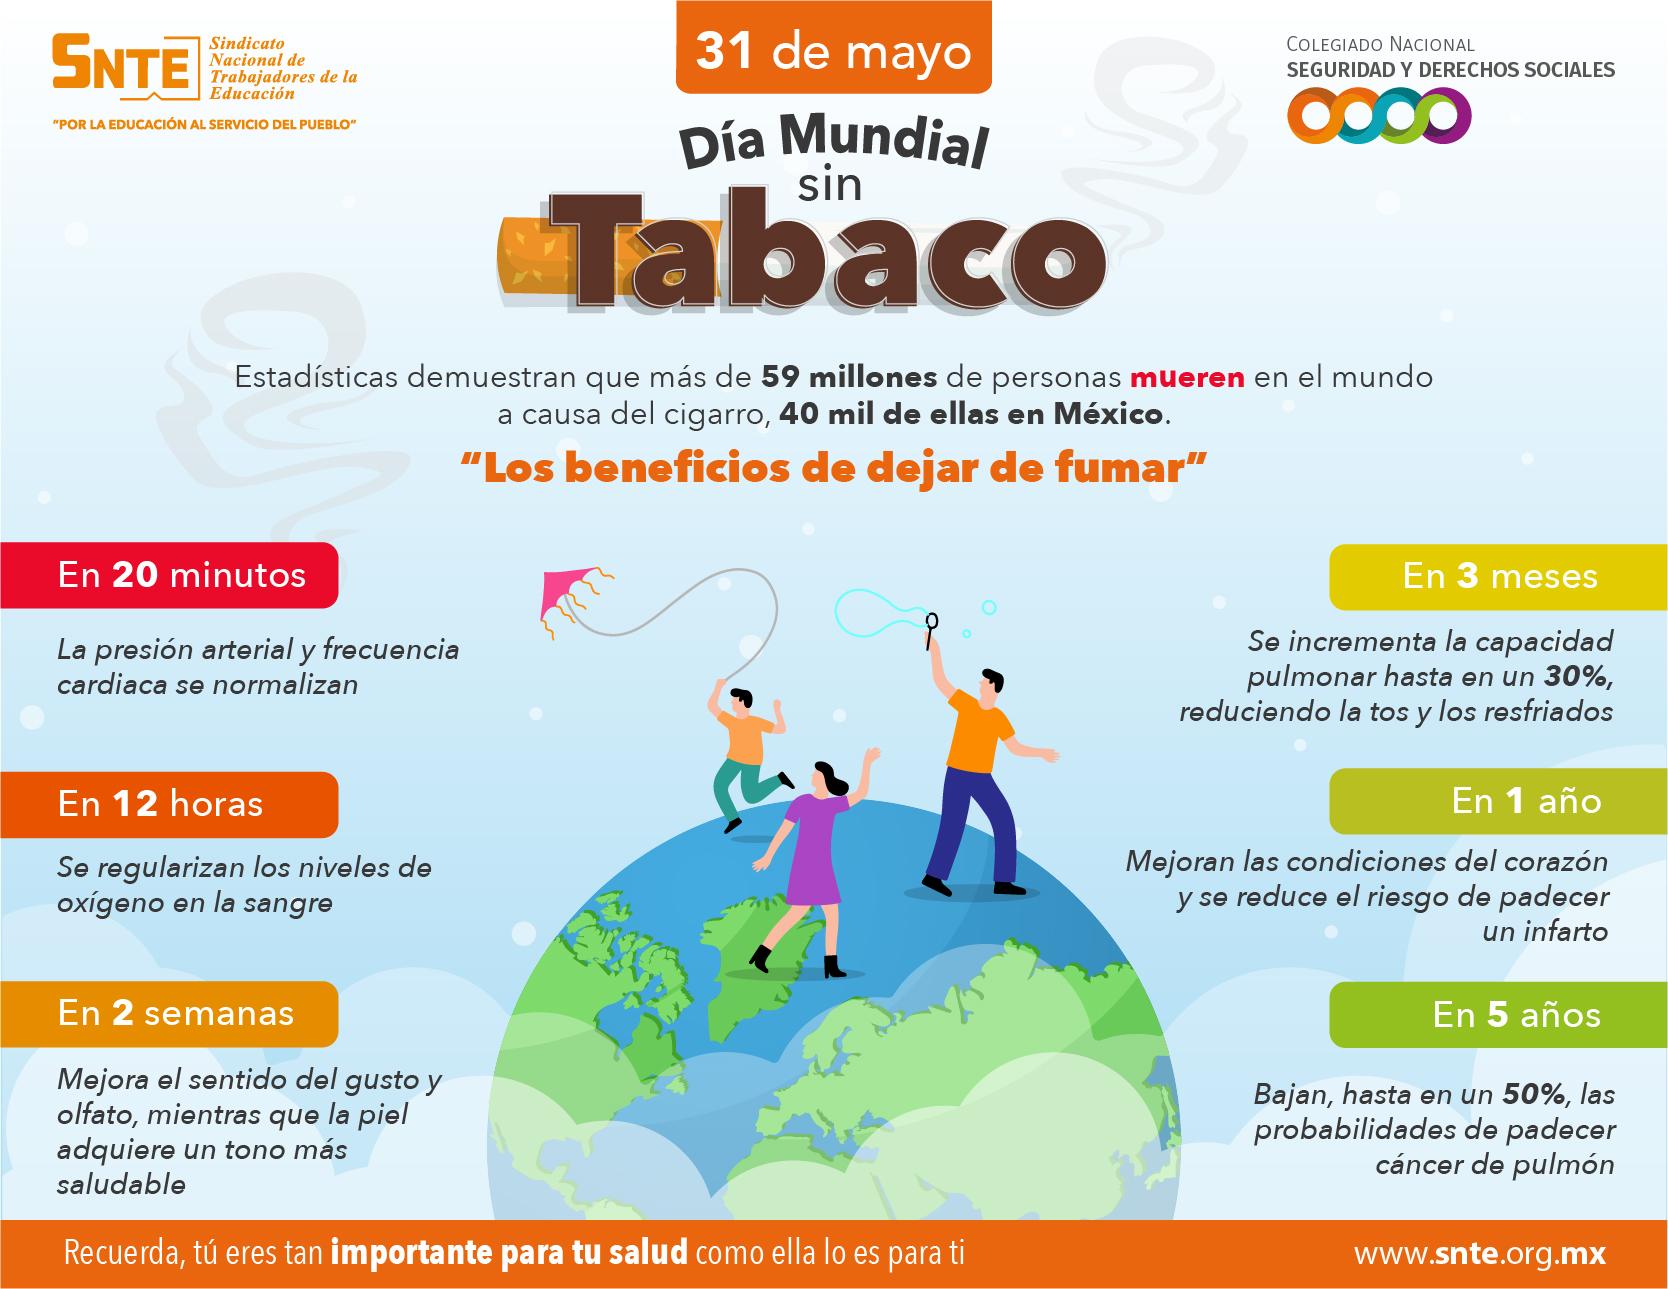 #DíaMundialSinTabaco